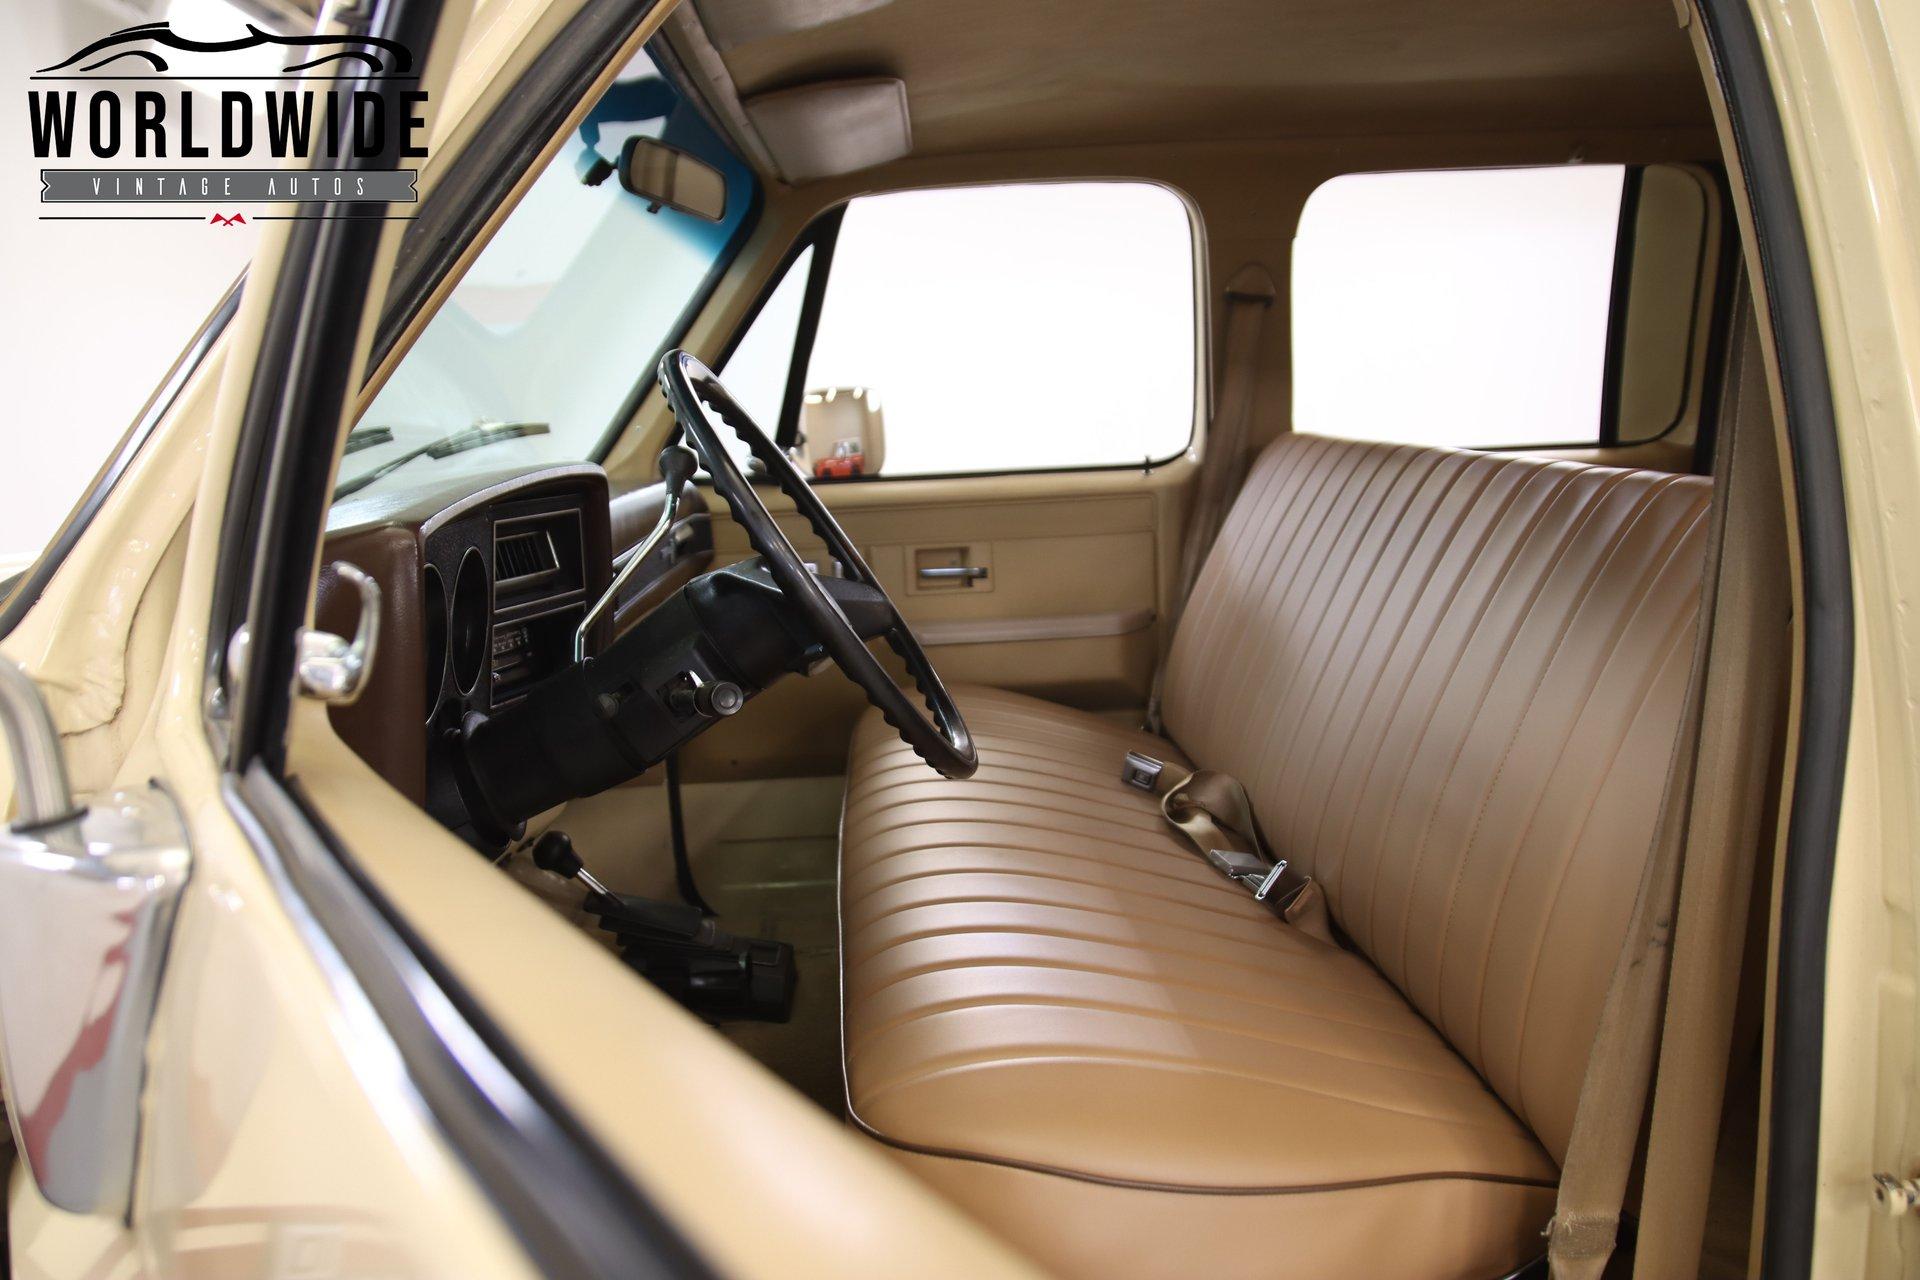 1986 Chevrolet Suburban